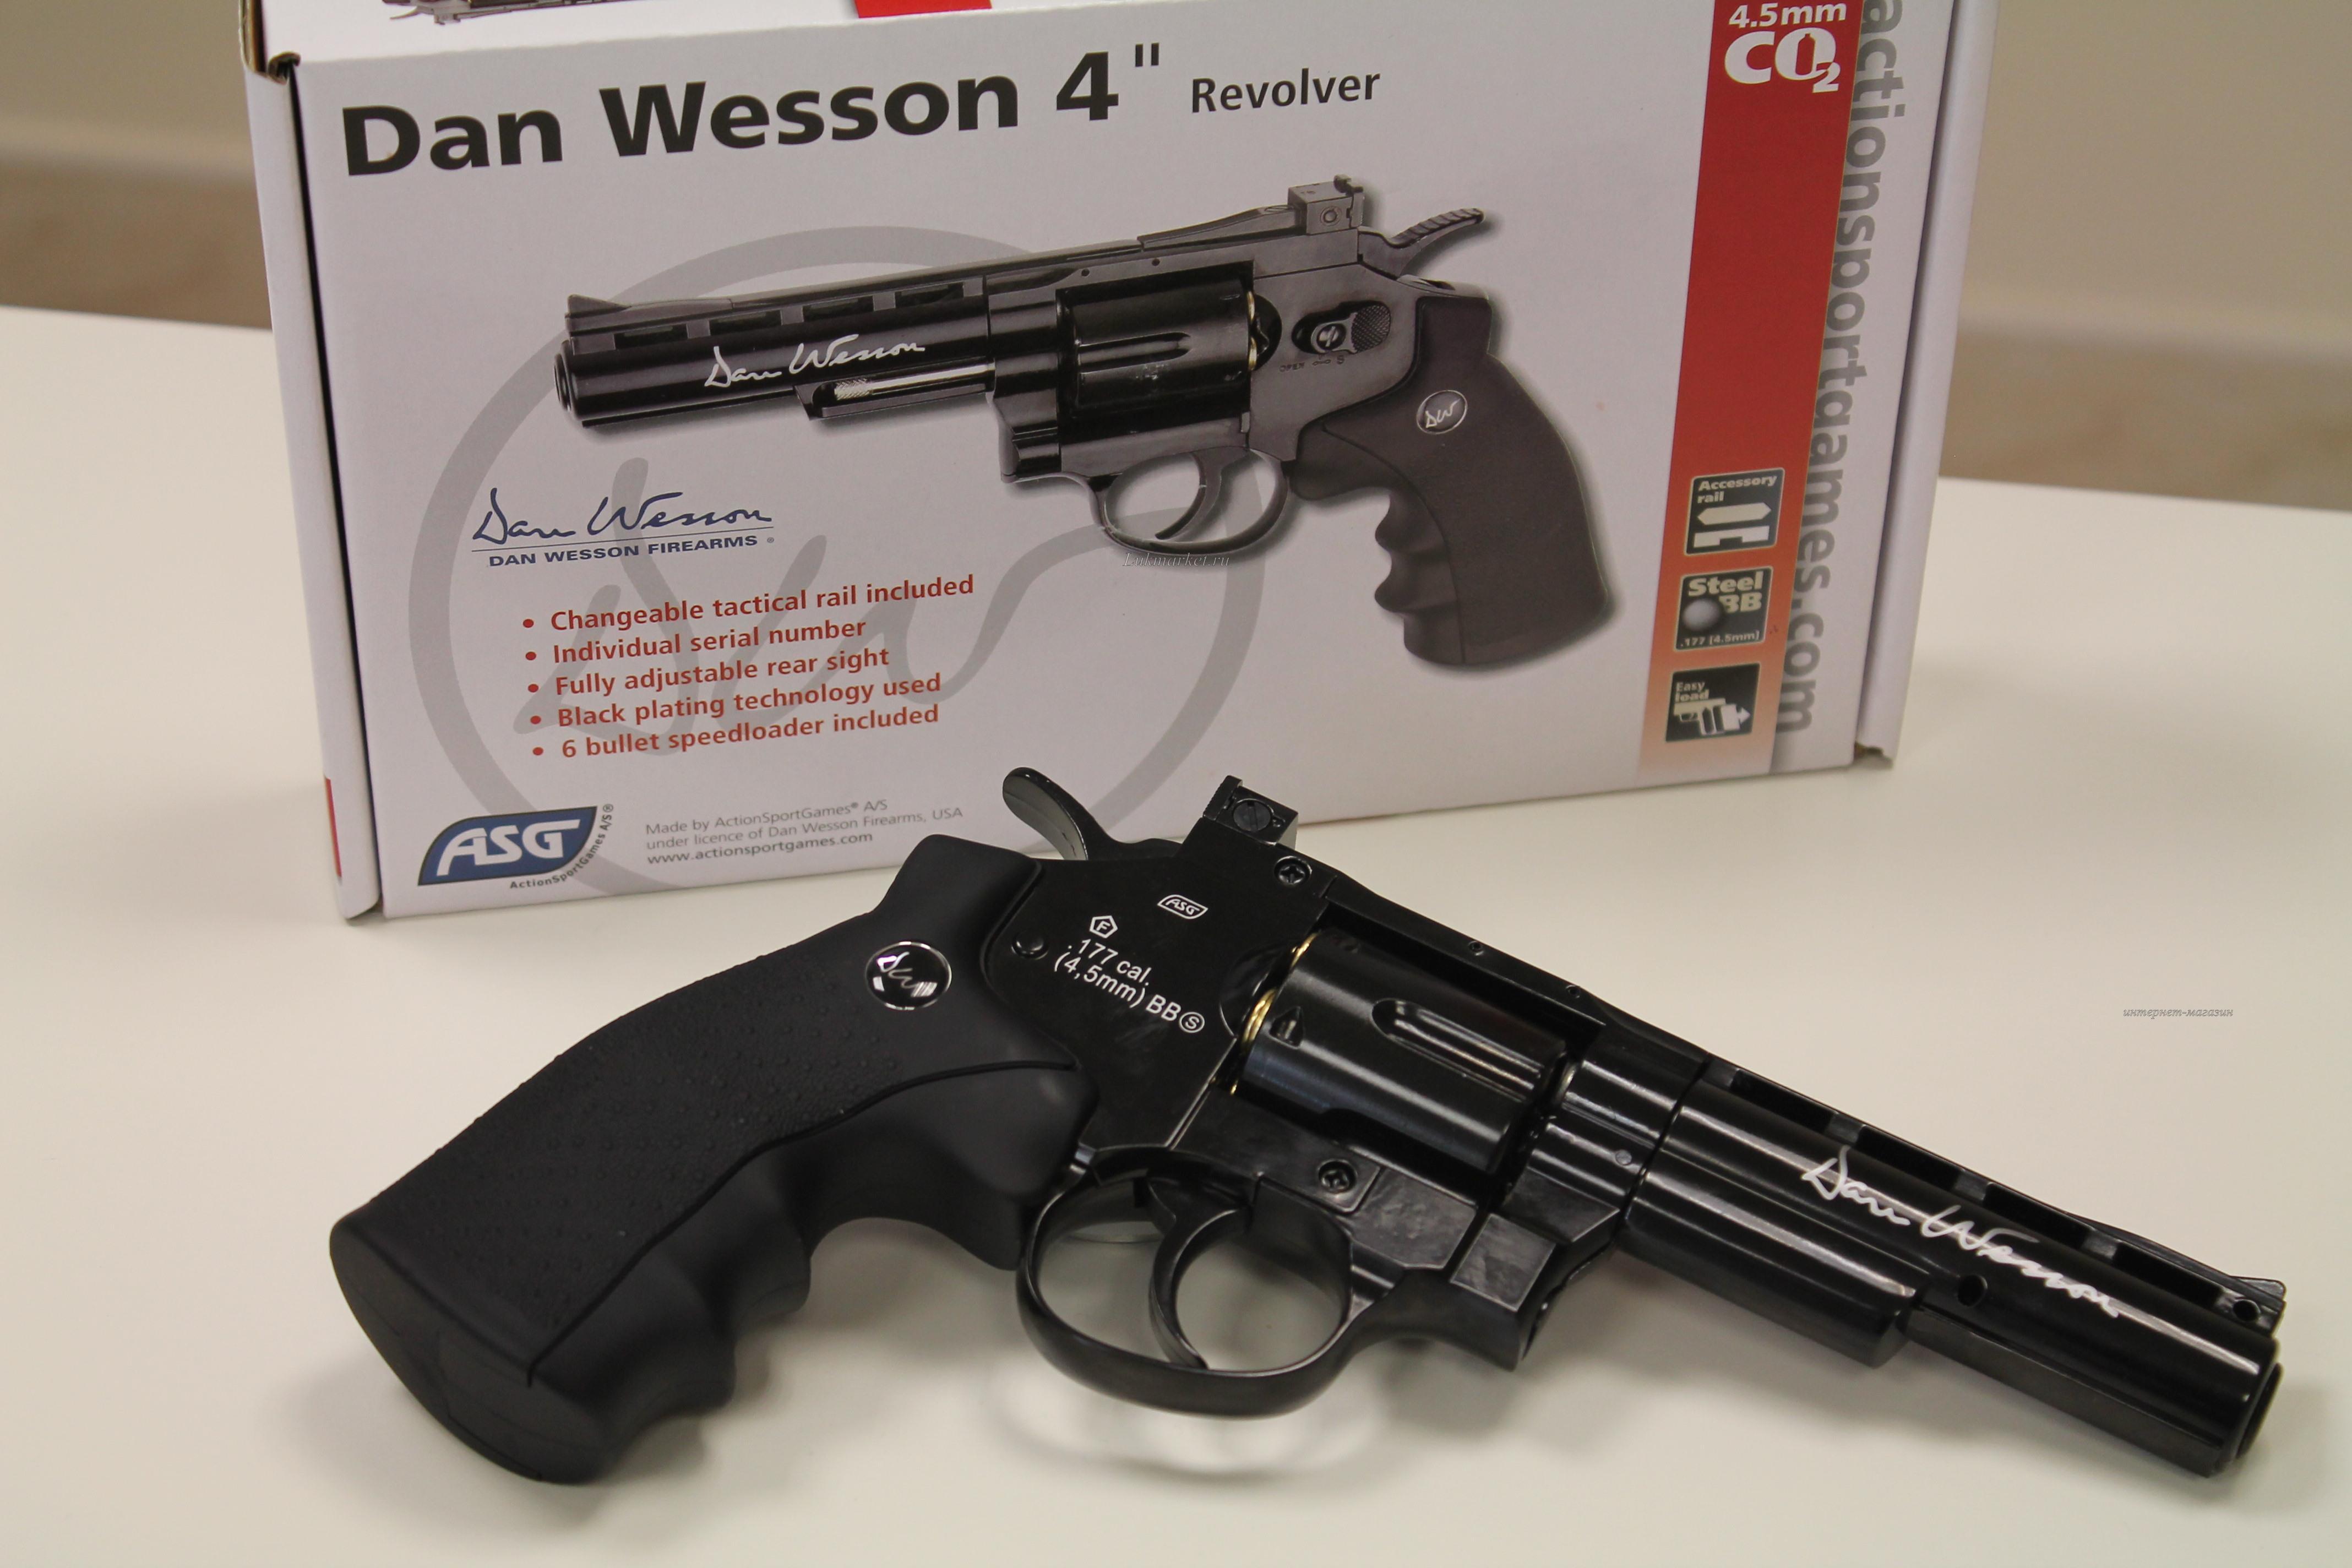 Револьвер ASG Dan Wesson 4 00461